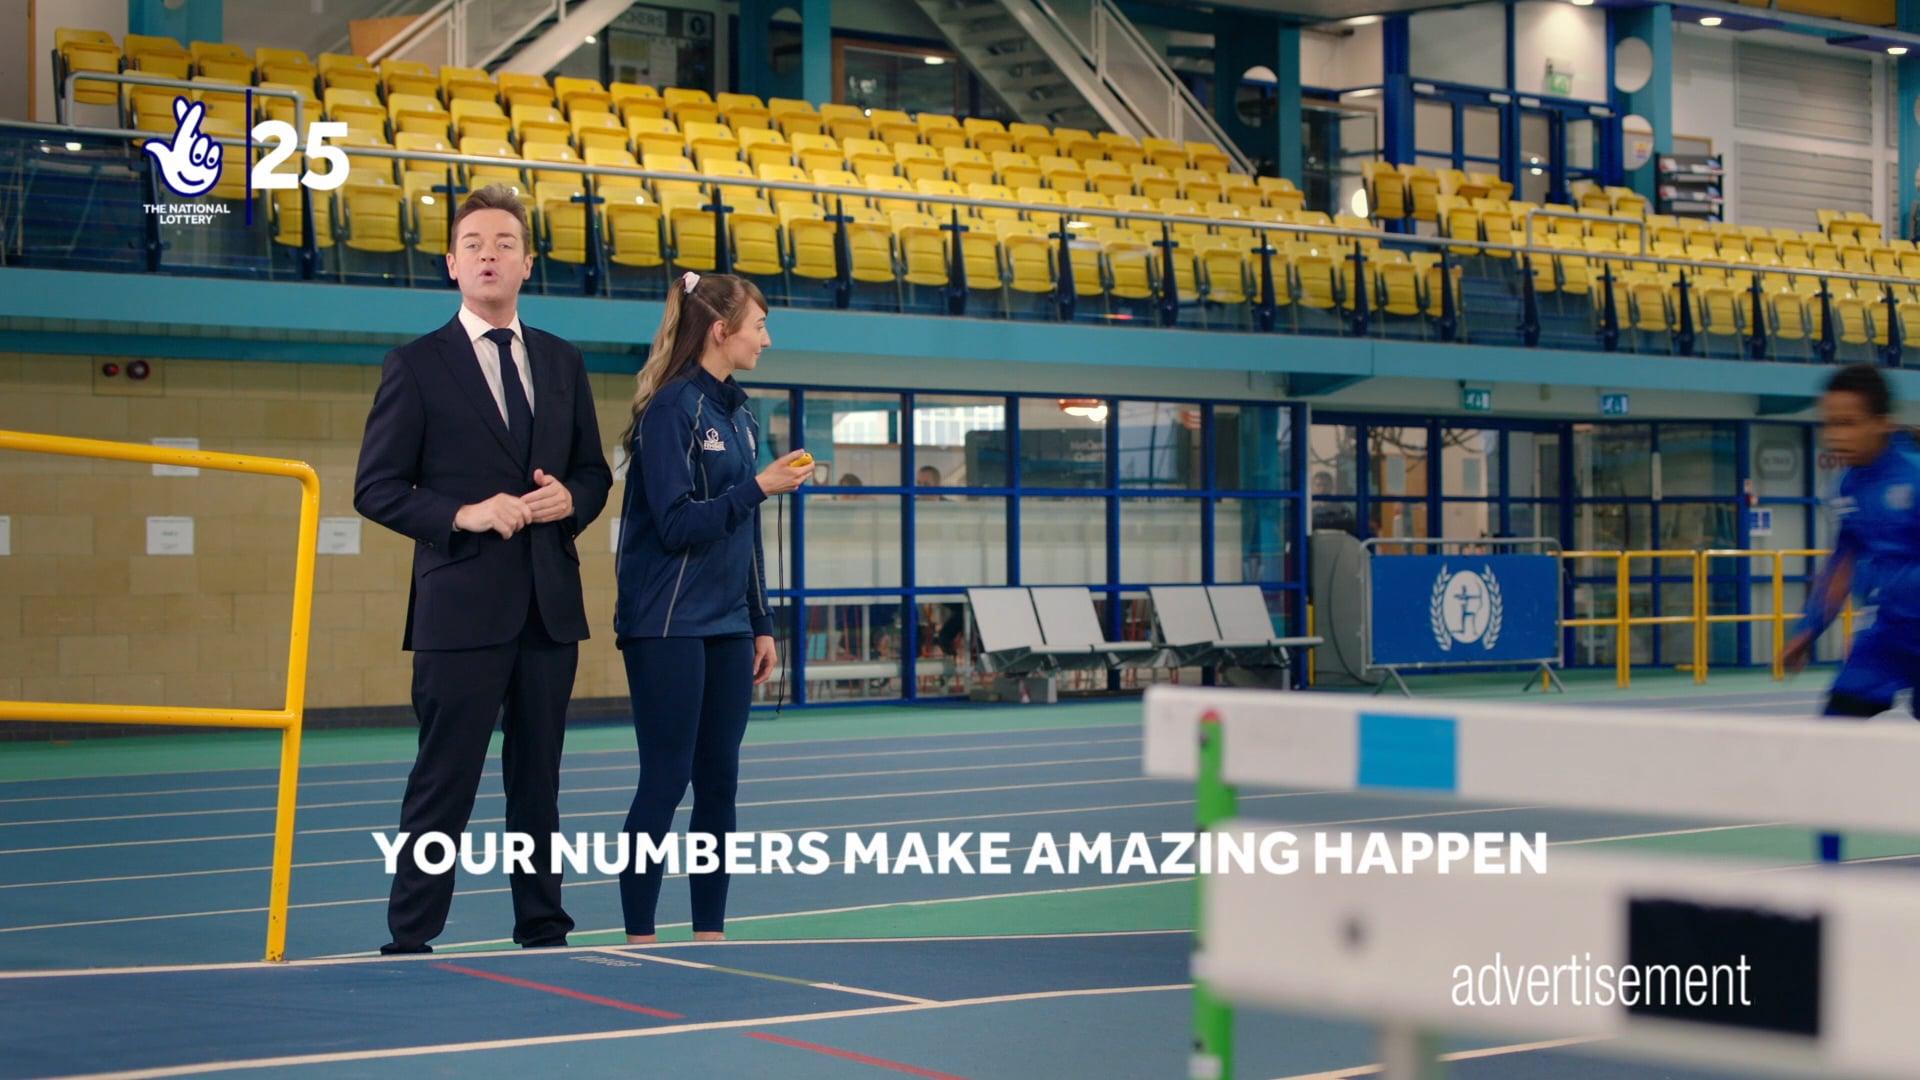 National Lottery Advert